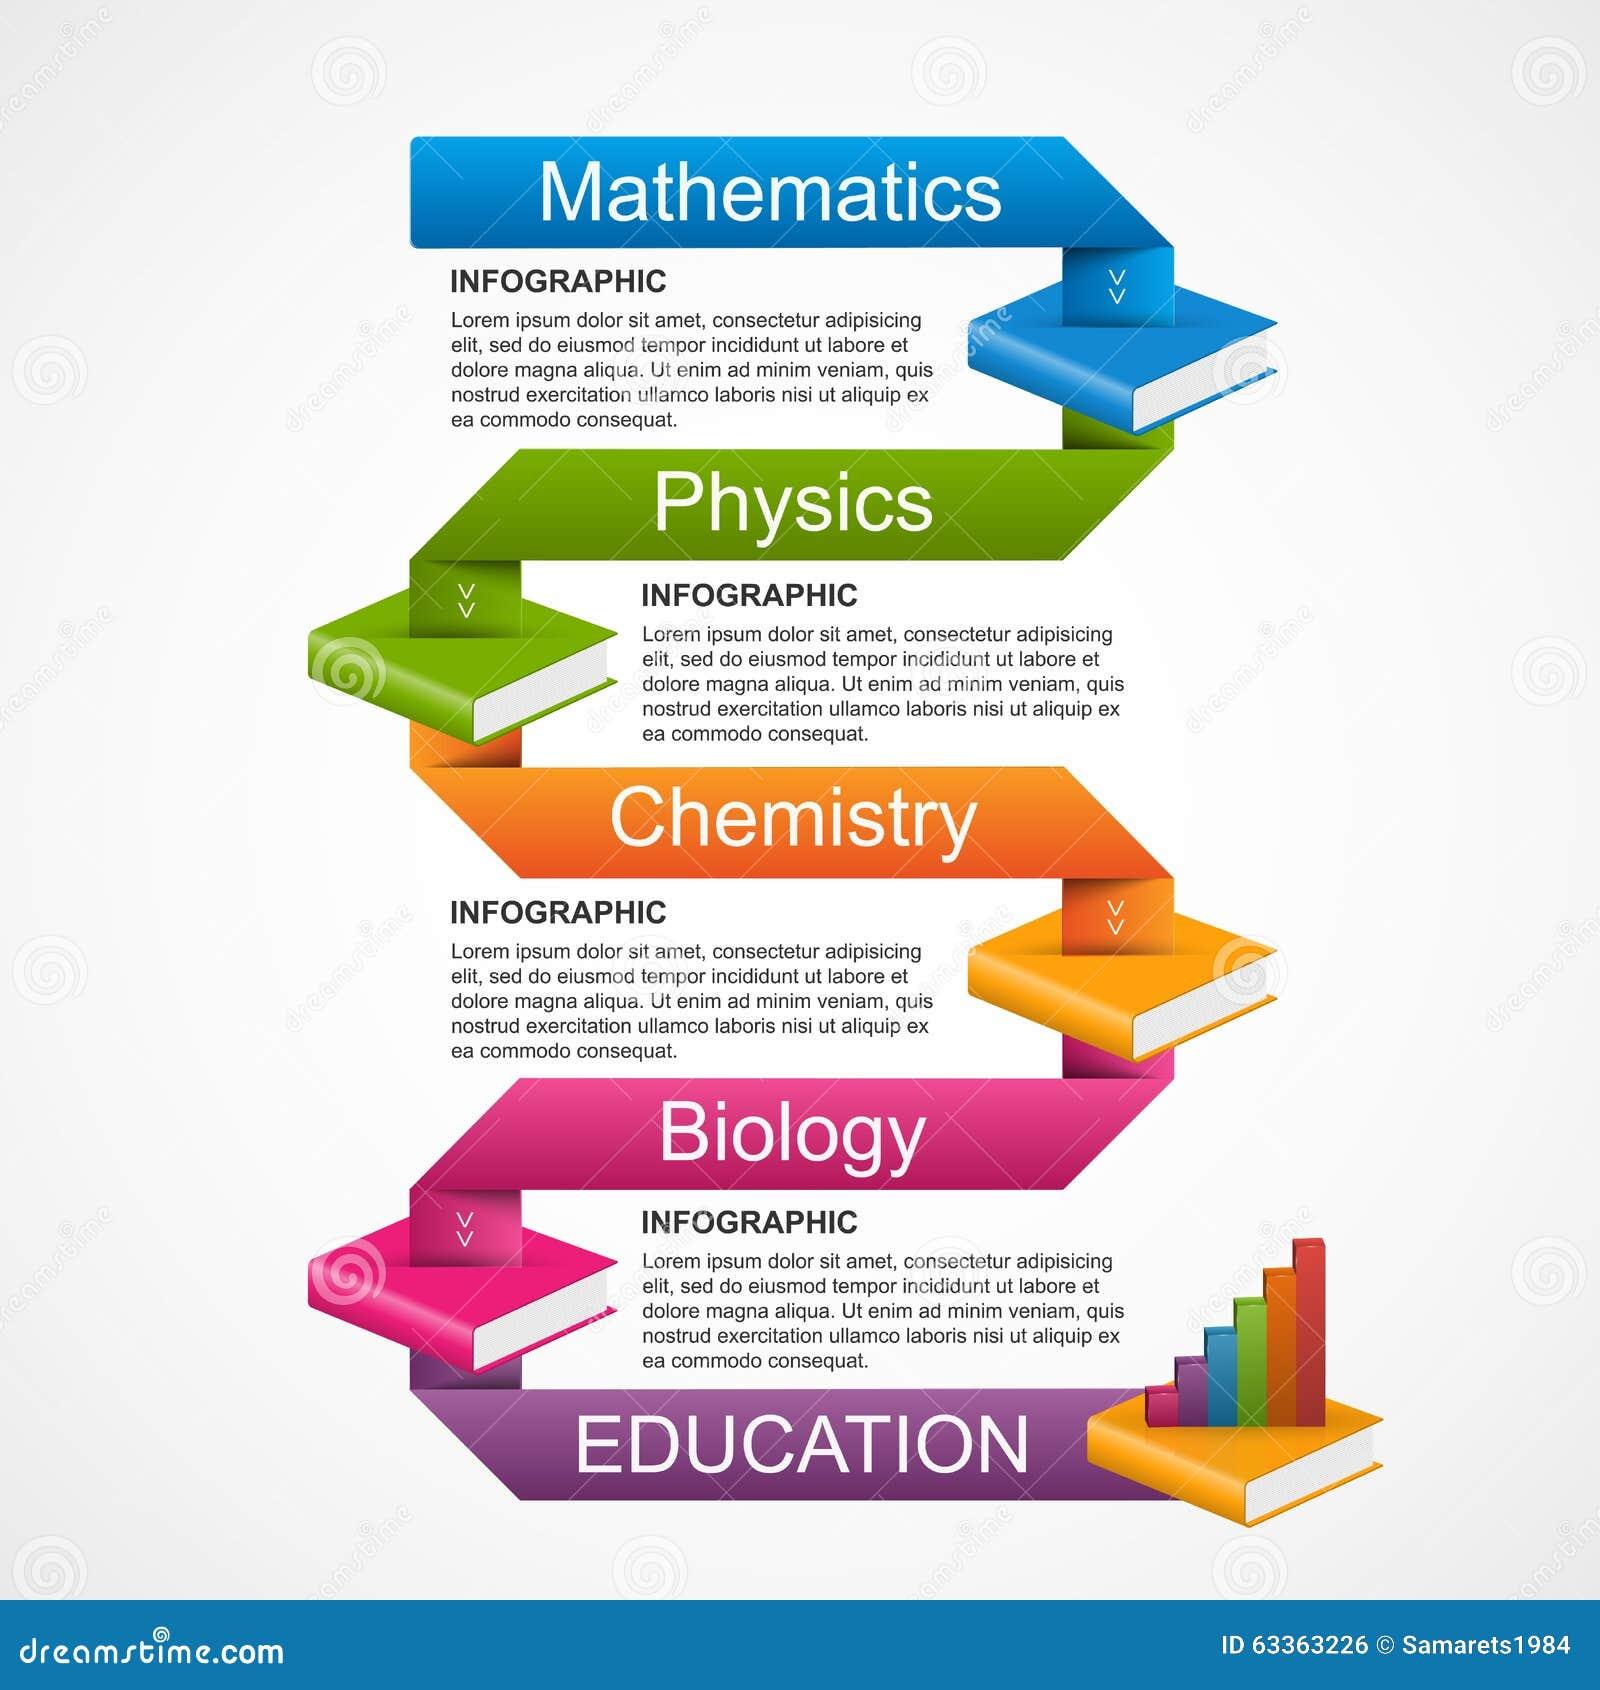 Free stock options education